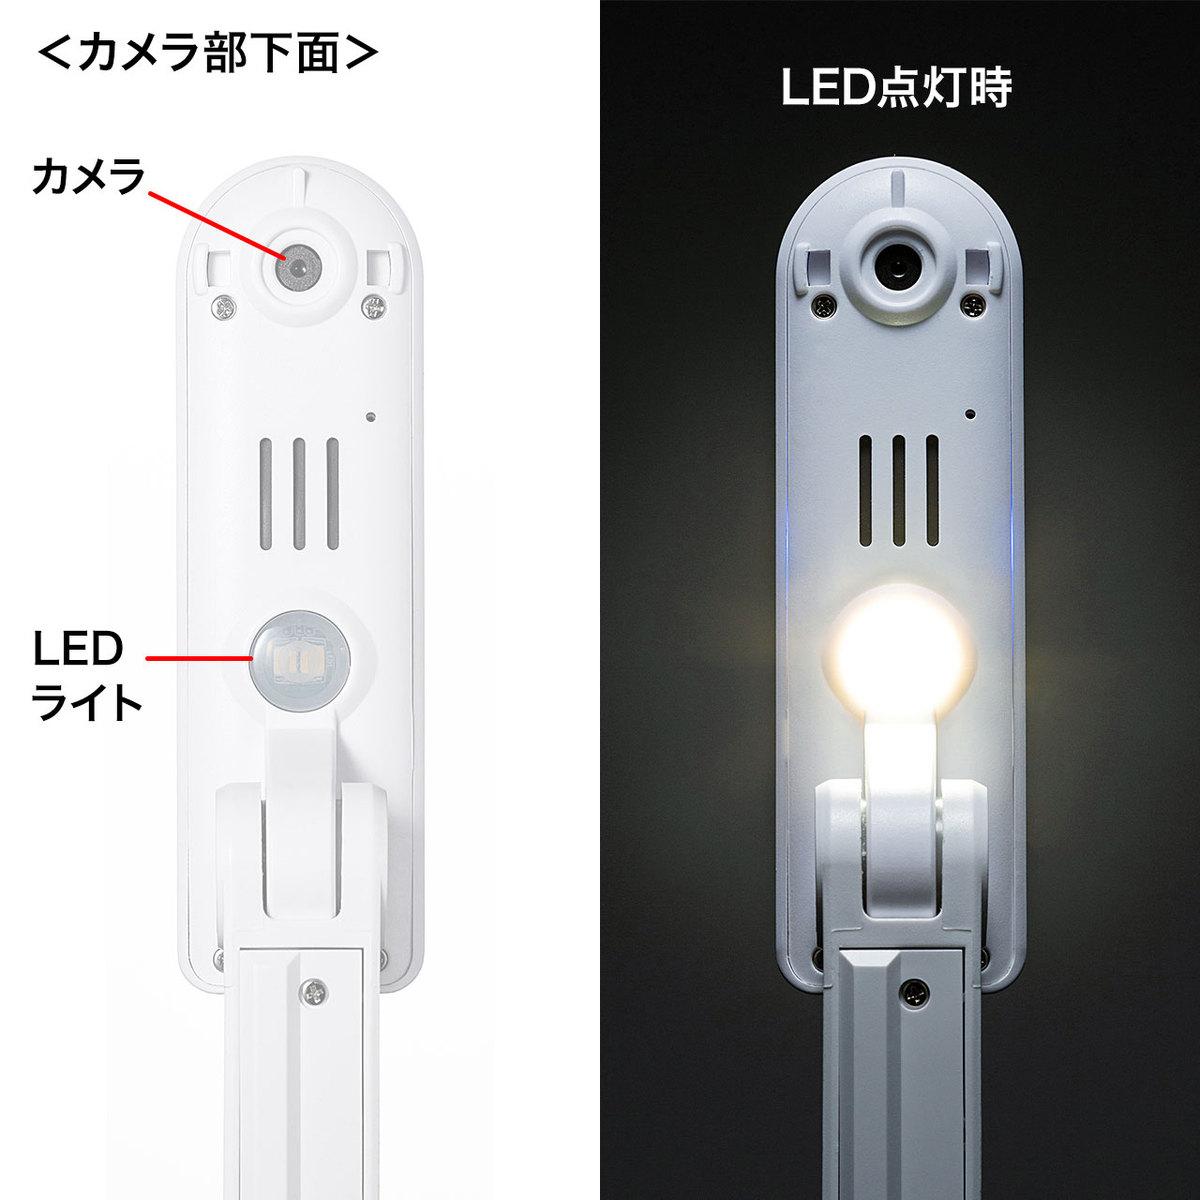 [CMS-V46W] USB書画カメラ(800万画素)